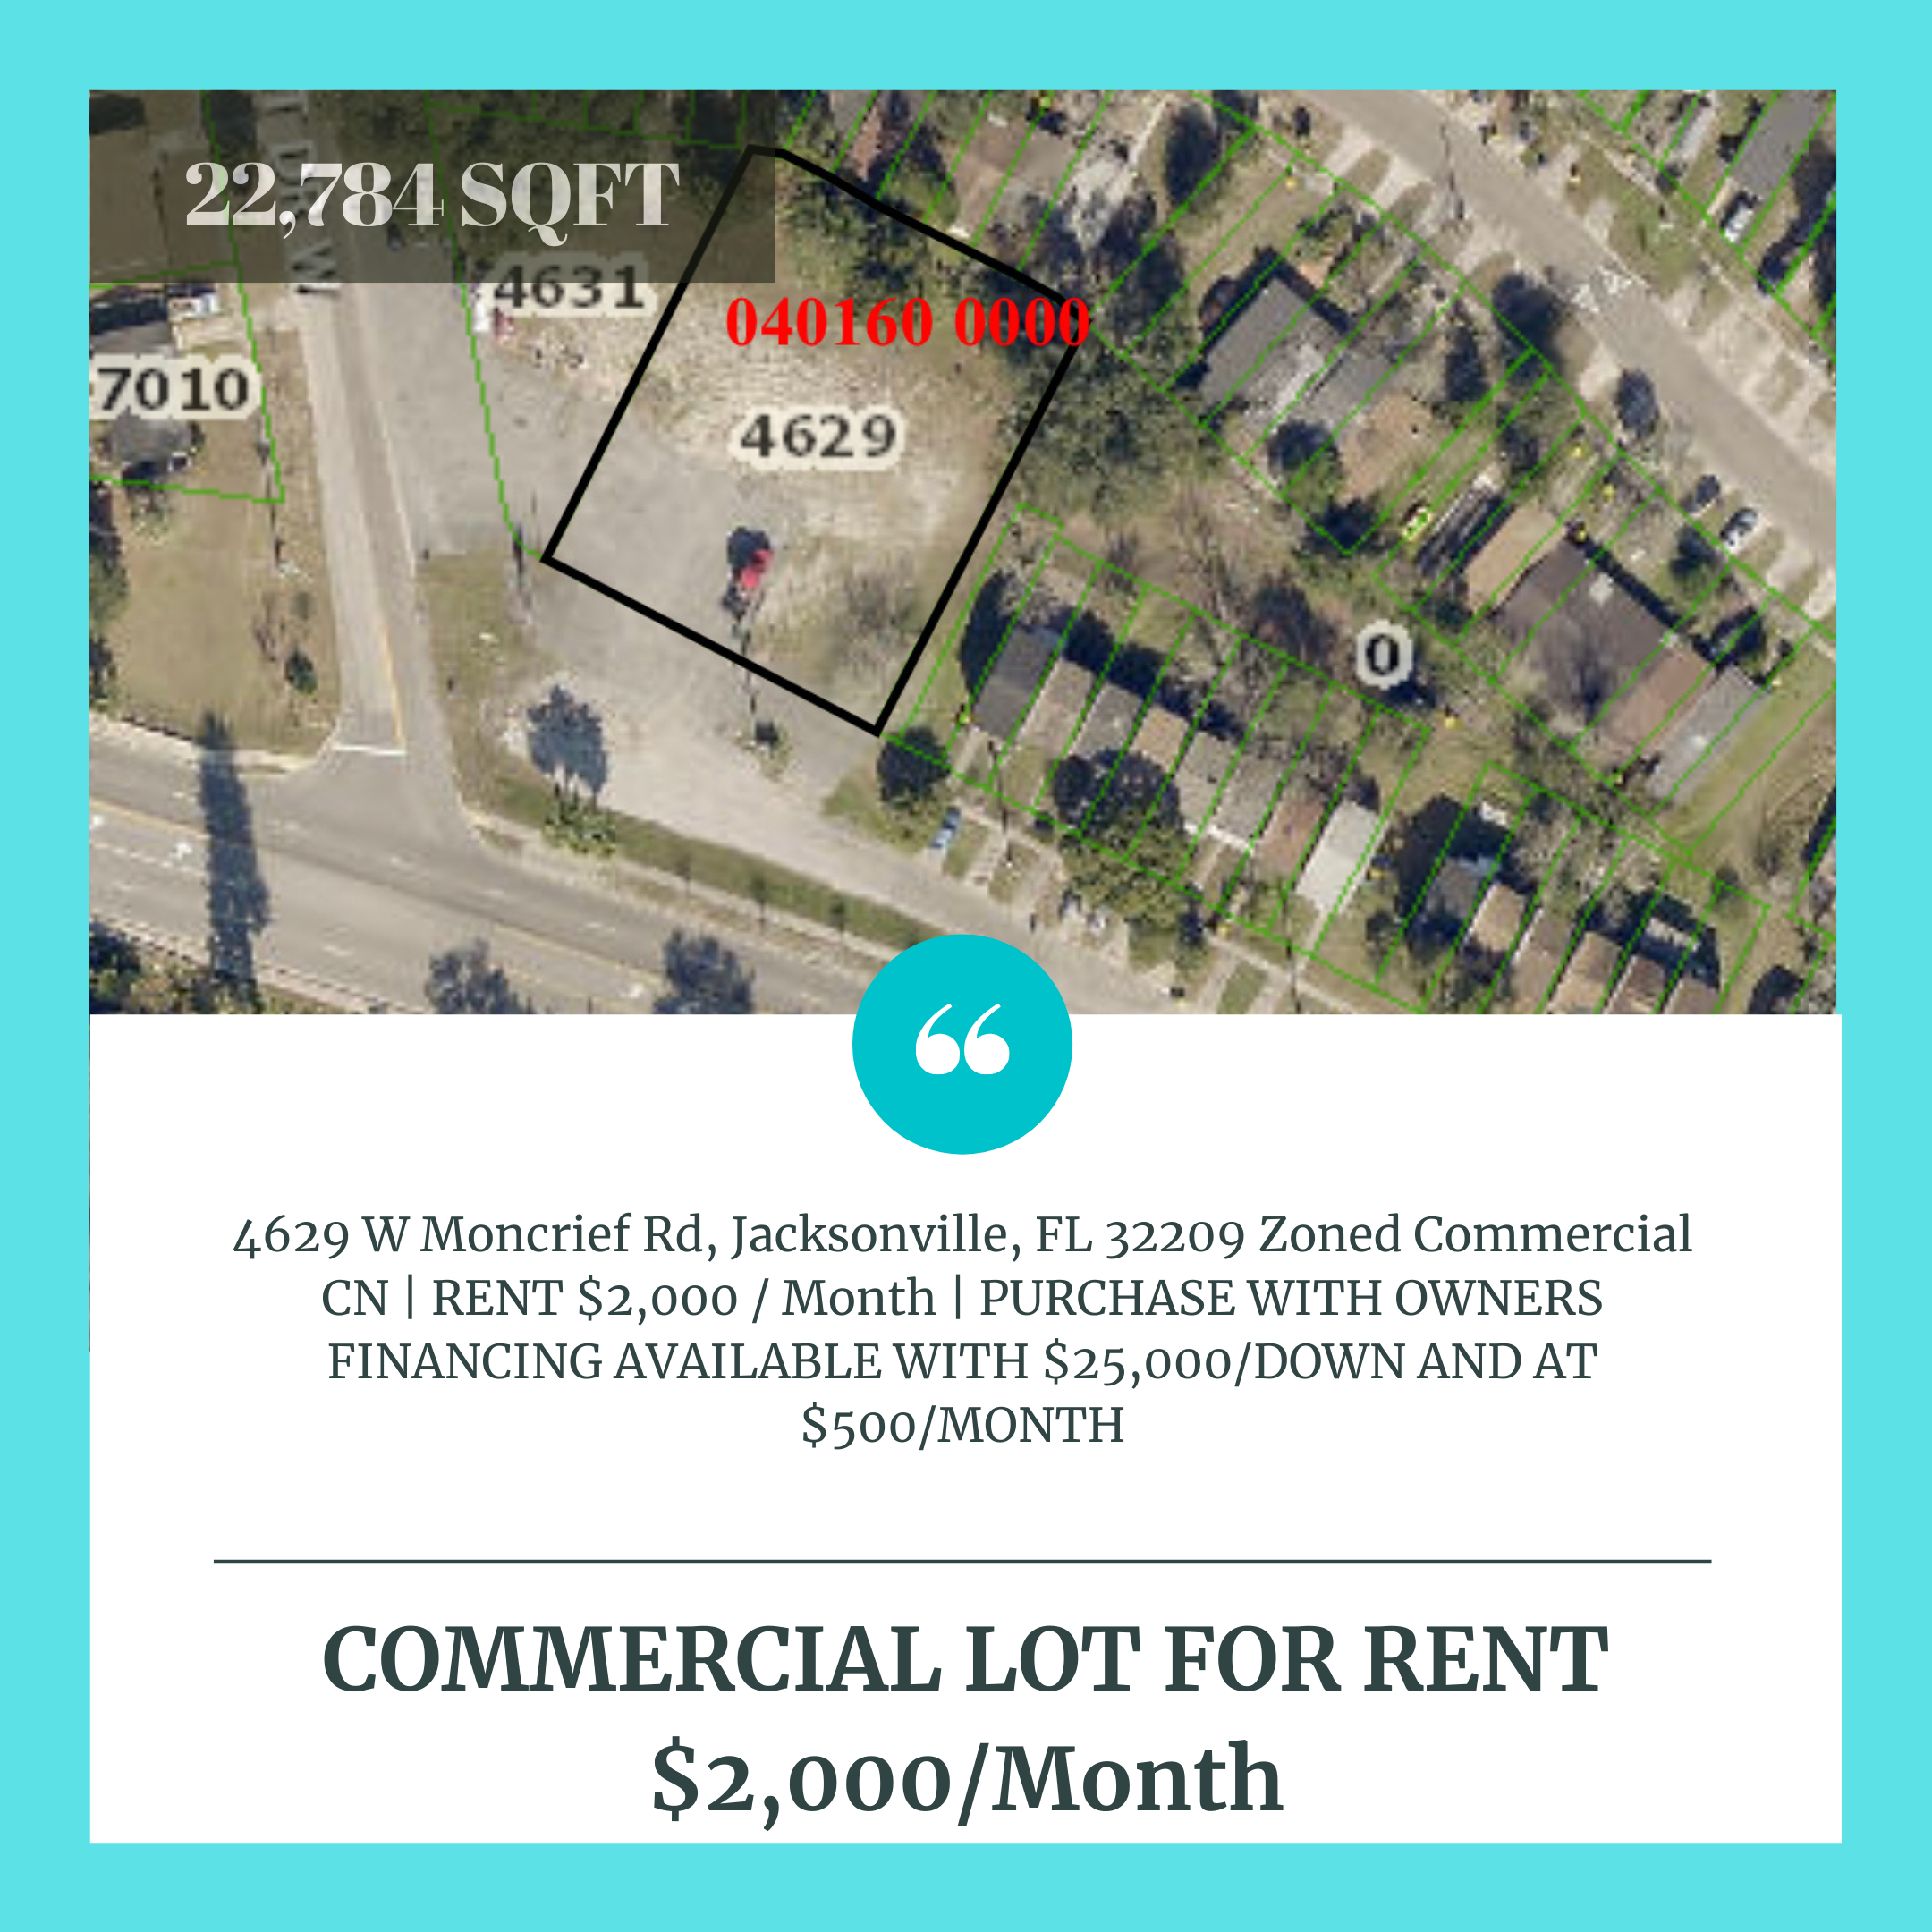 4629 W Moncrief Rd, Jacksonville, FL 32209